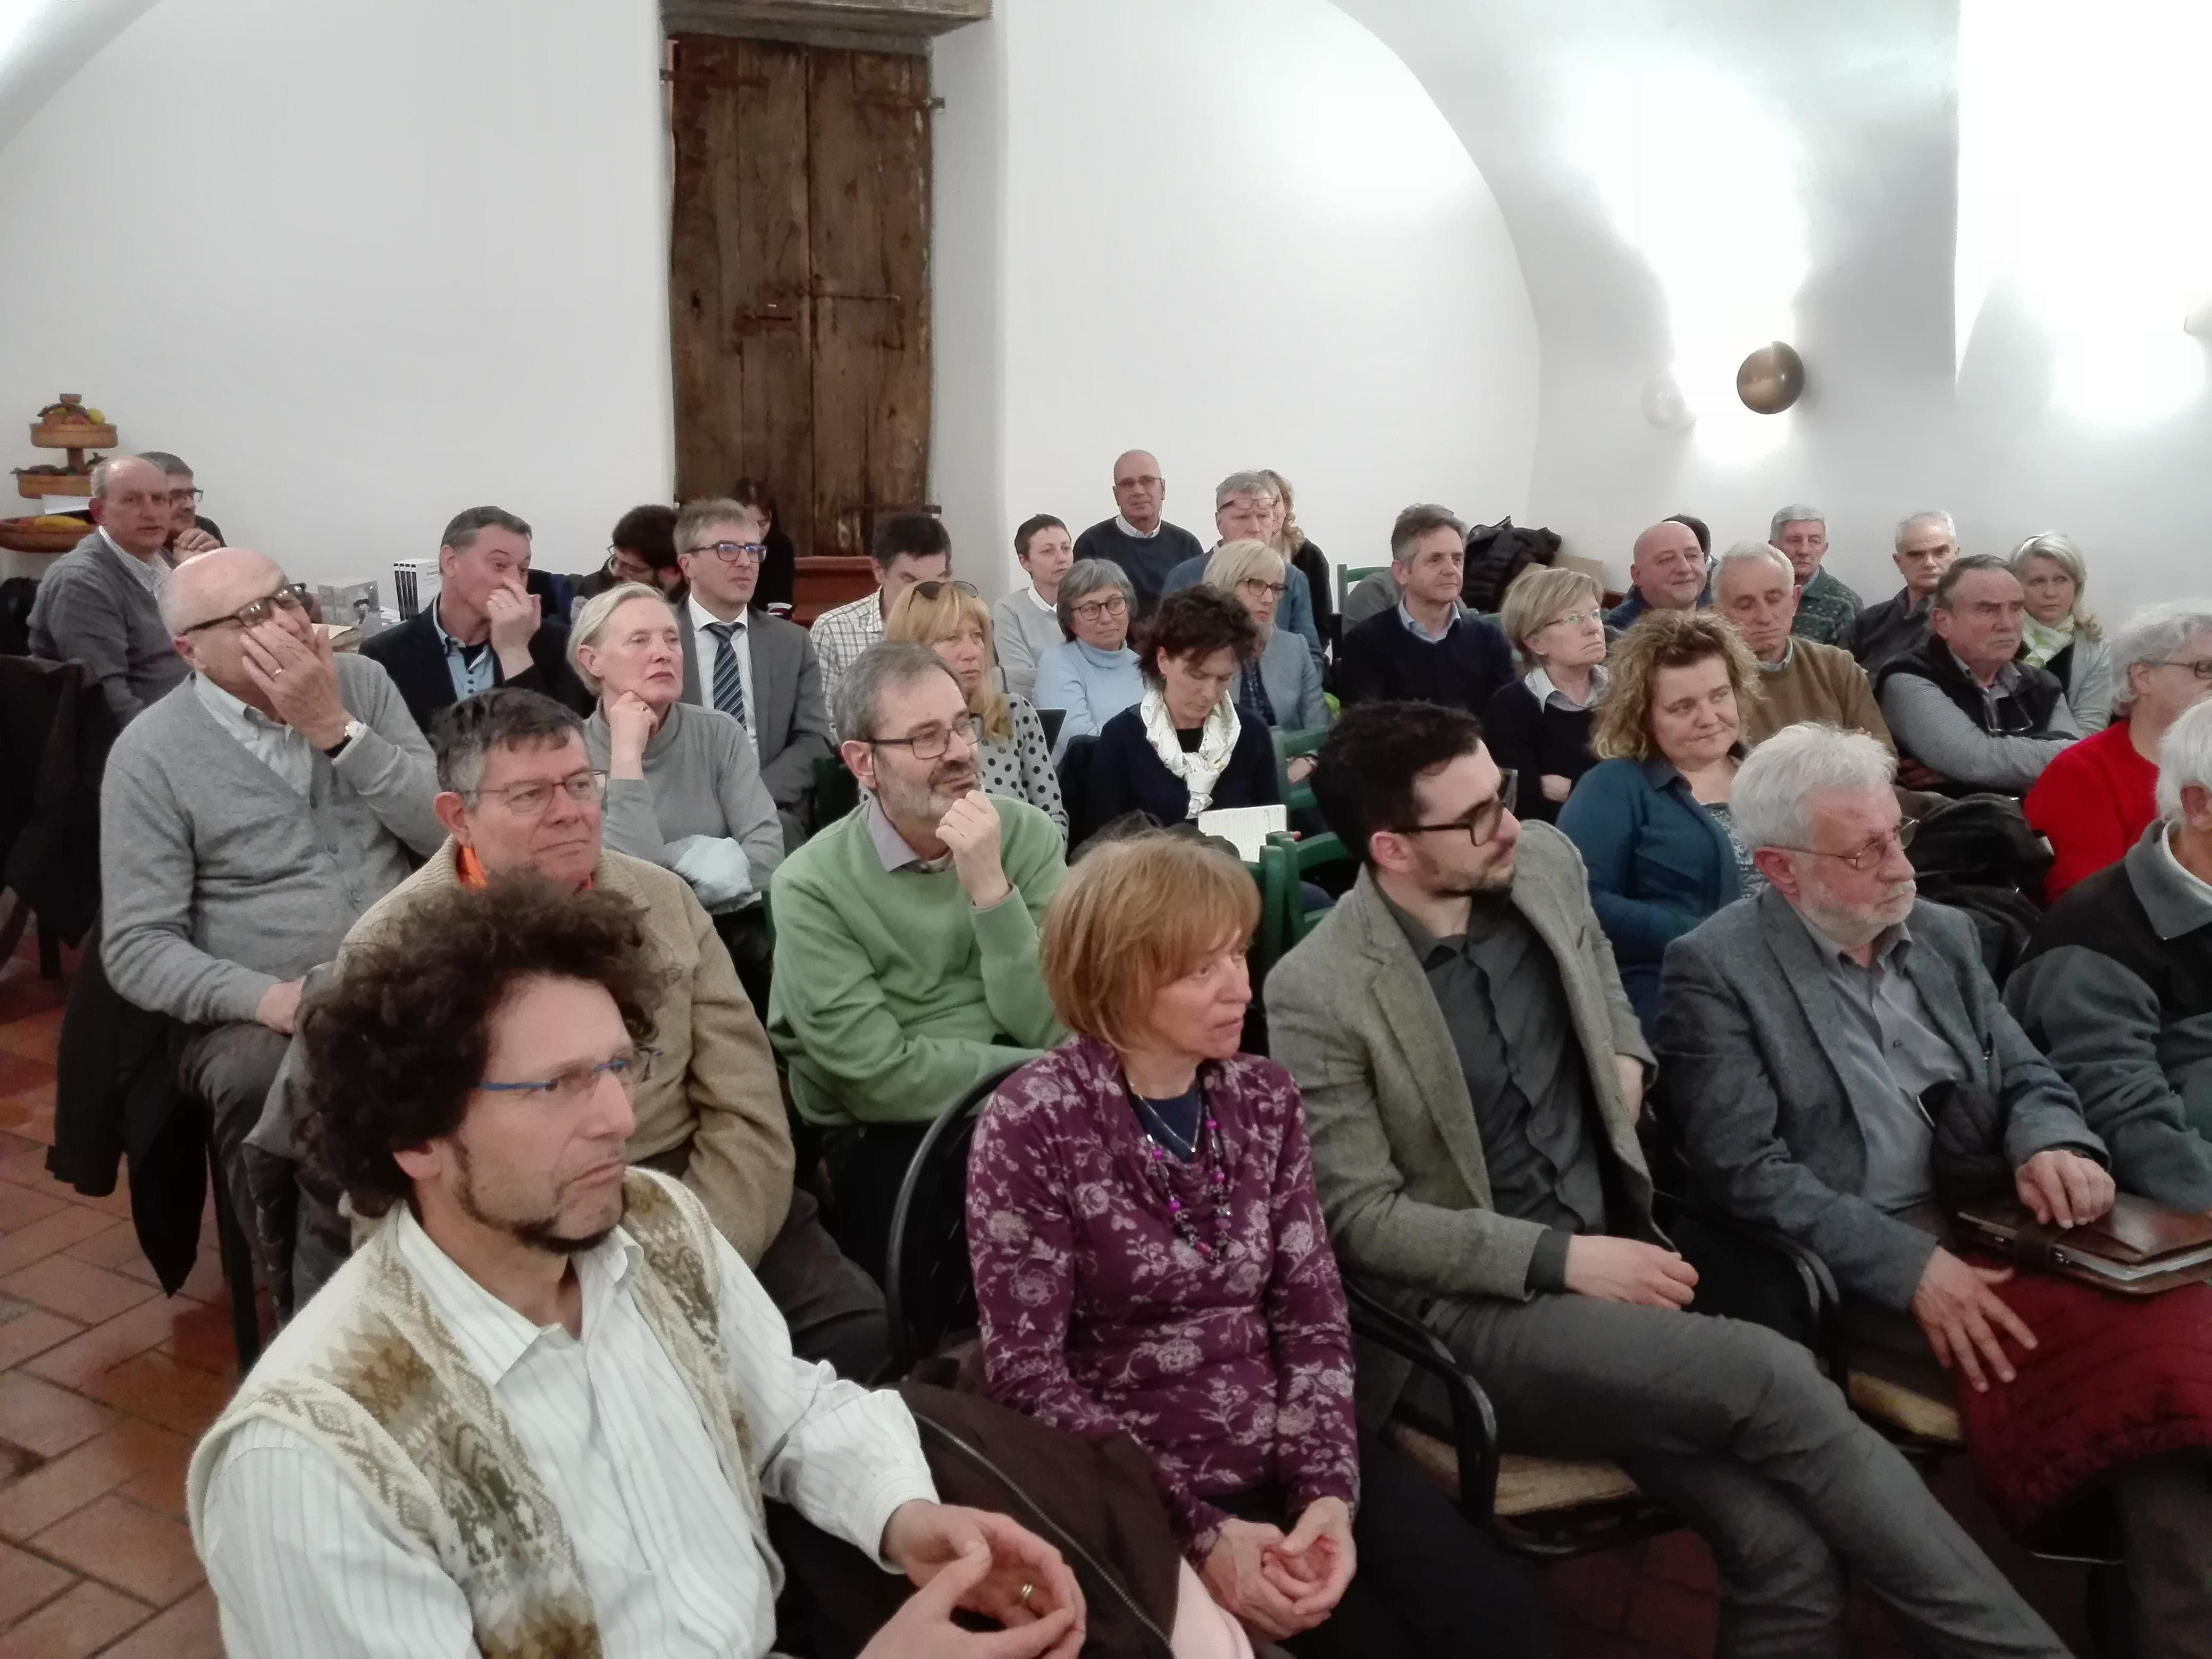 64_assemblea ghislandi 07-04-2018